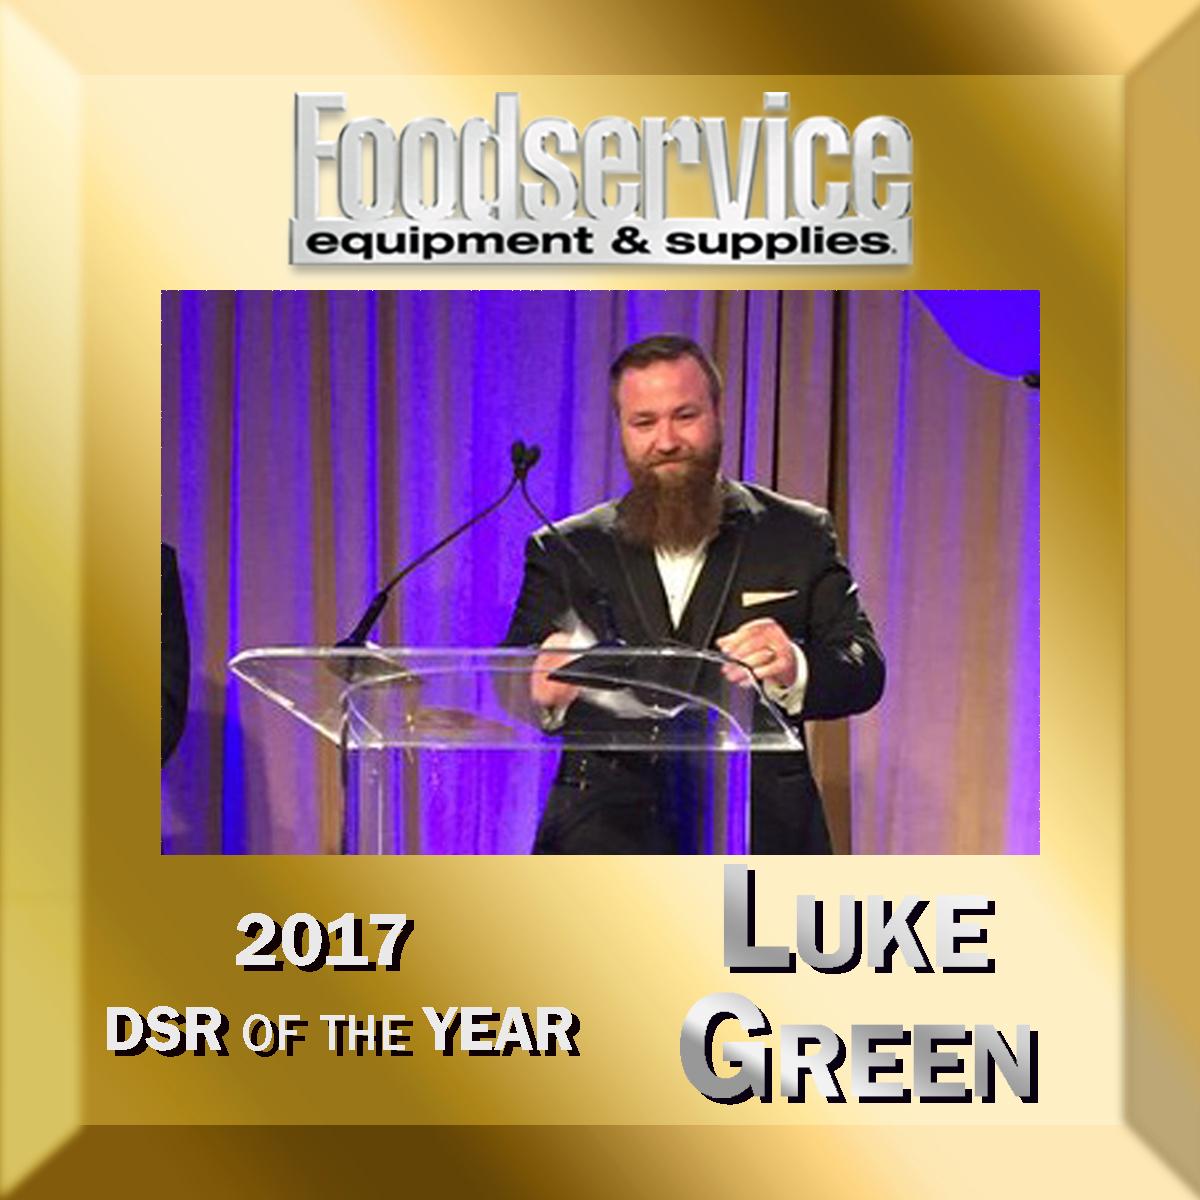 Luke Green DSR of the Year 2017